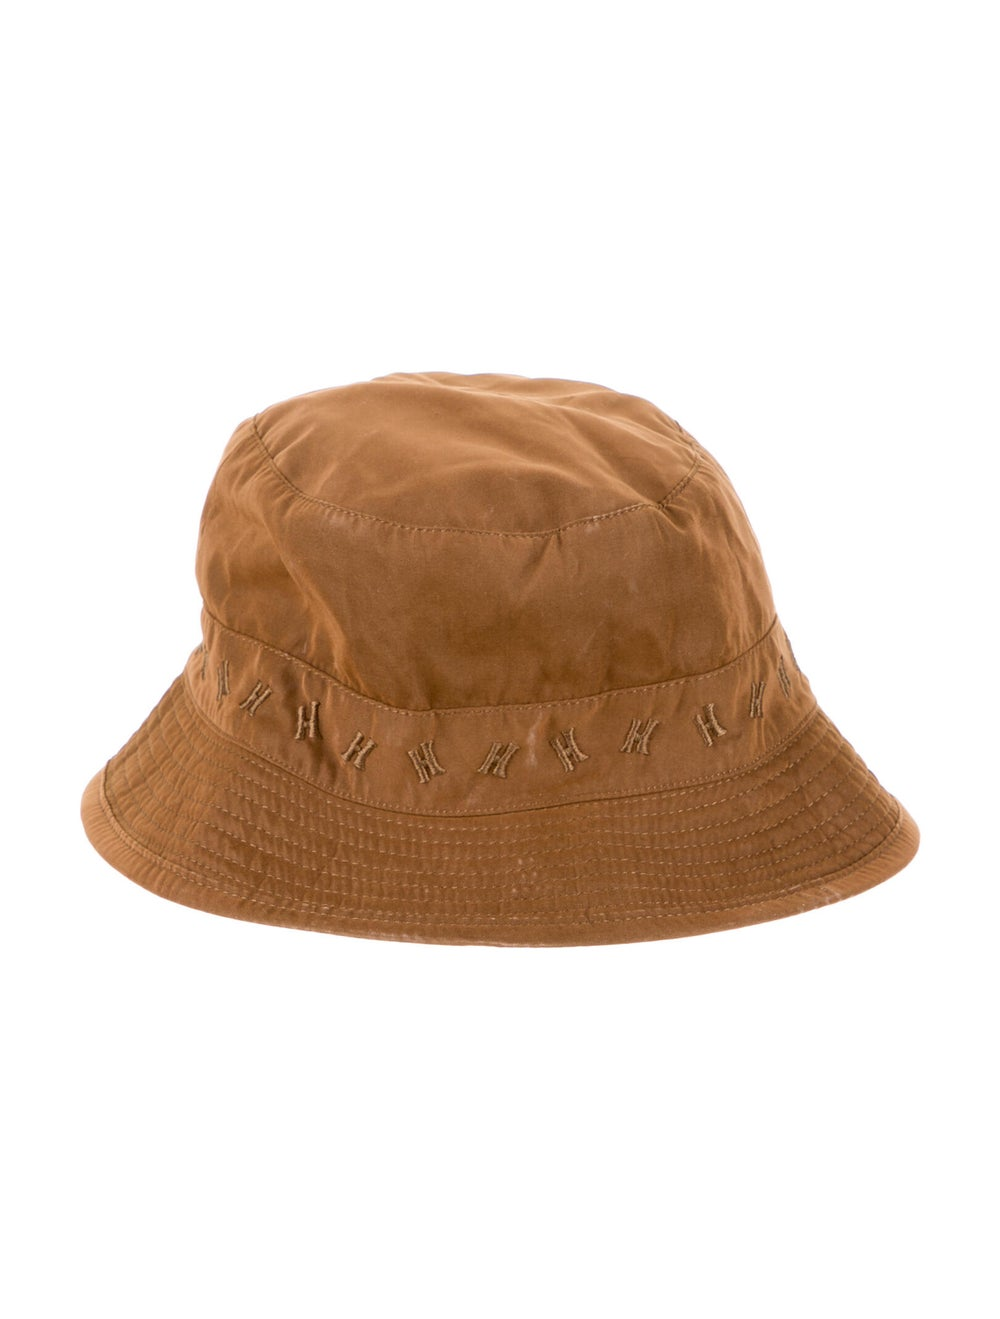 Hermès Logo Woven Bucket Hat Brown - image 1